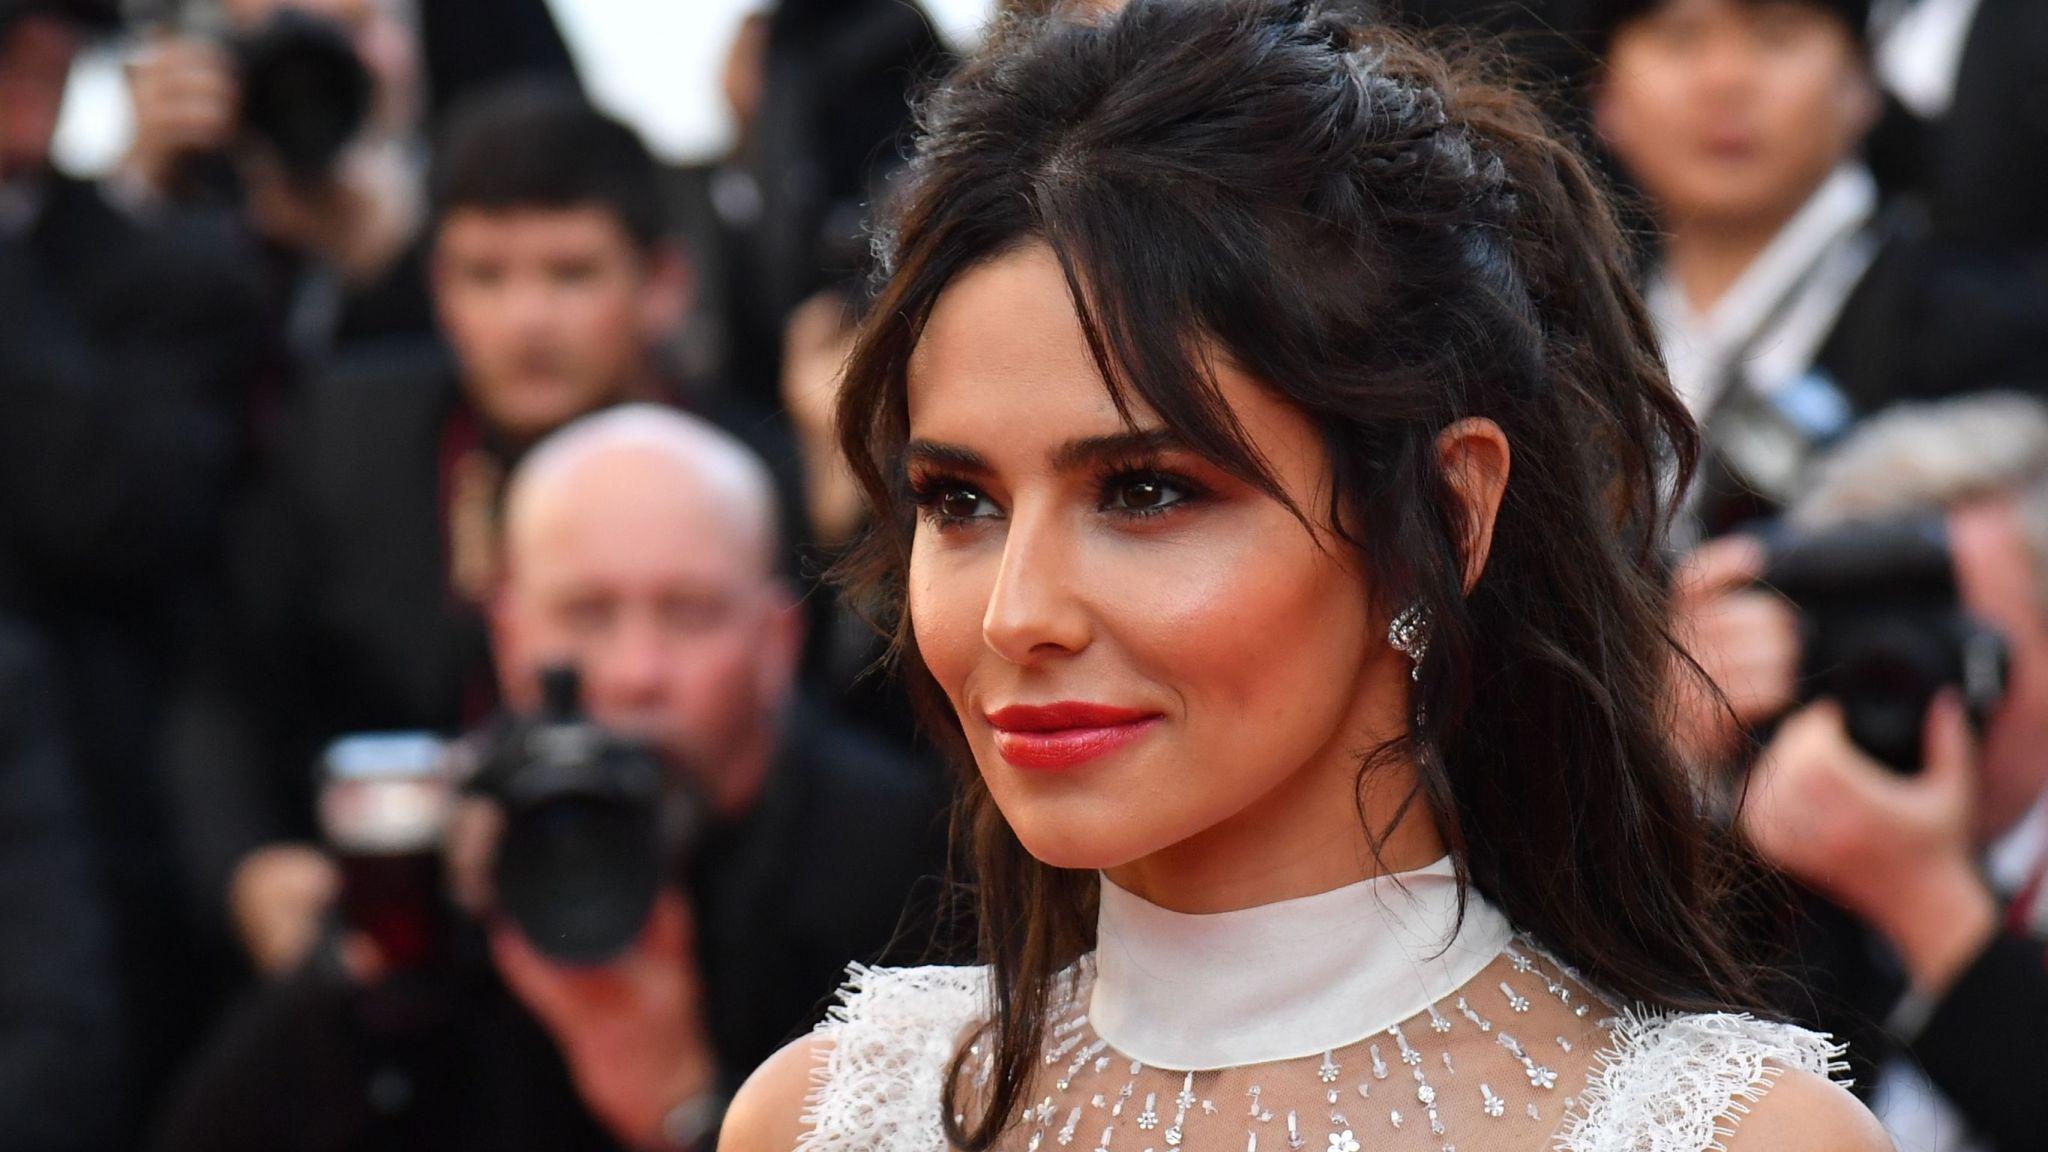 Cheryl, 35, has spoken out following her recent X Factor performance